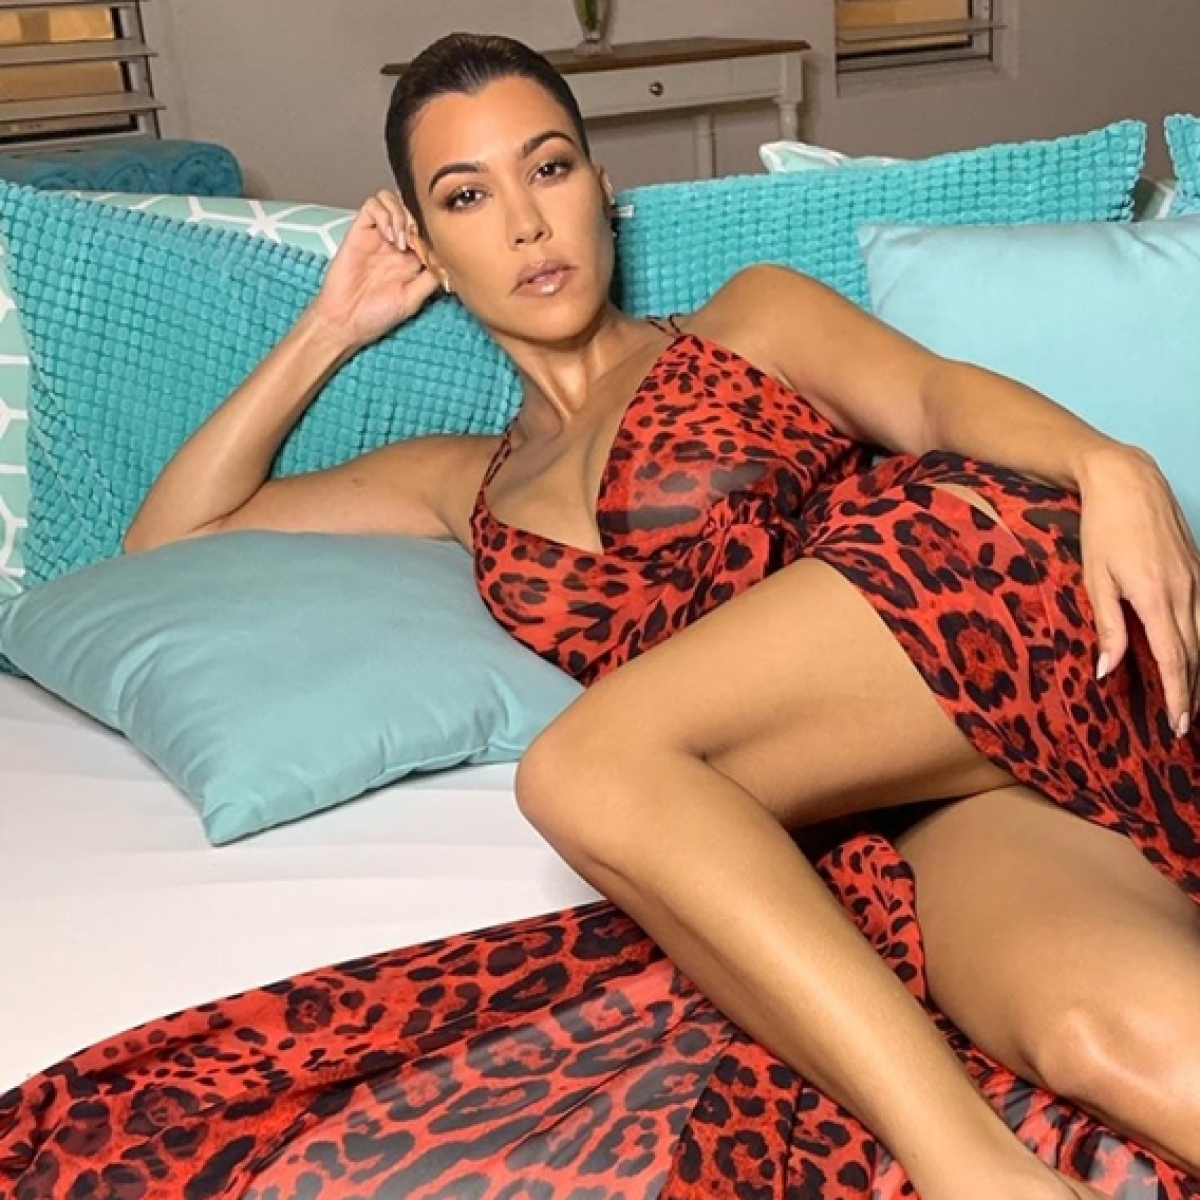 Kourtney Kardashian has considered quitting 'Keeping Up With The Kardashians'